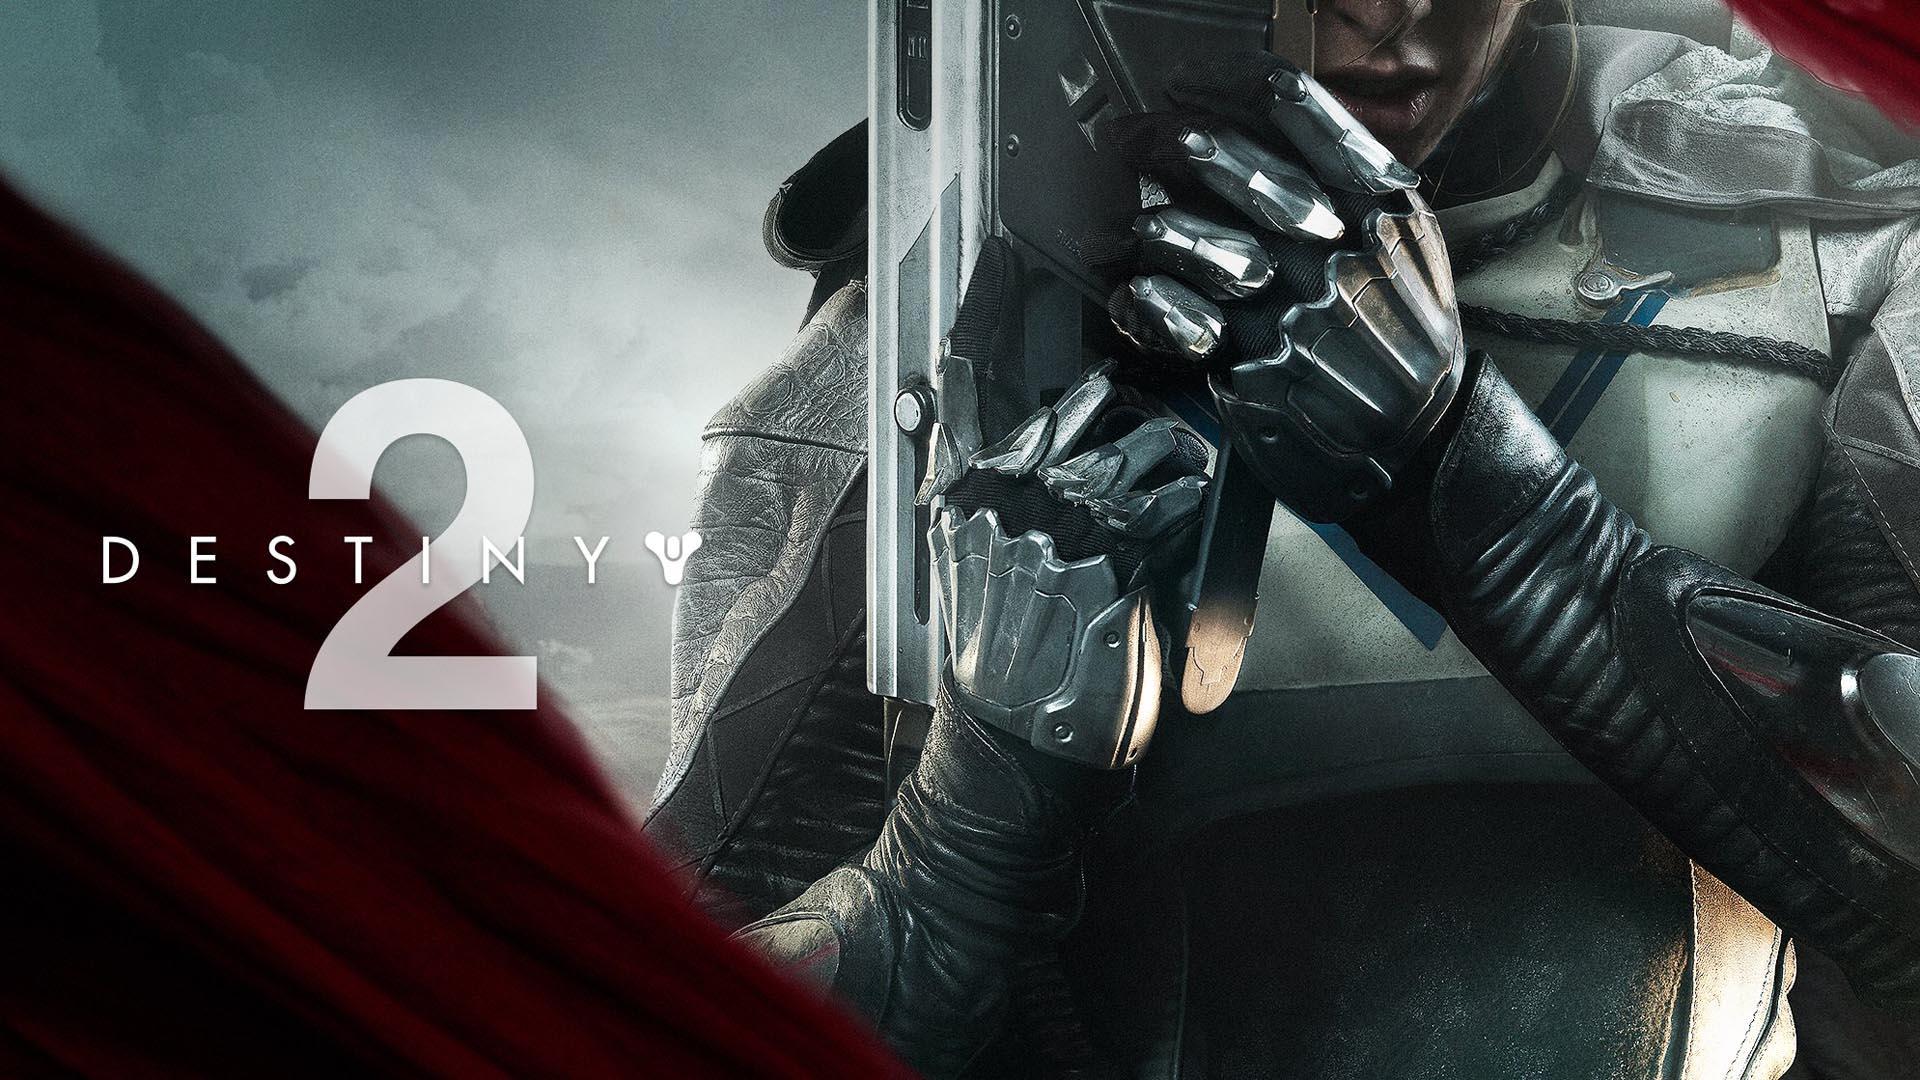 destiny 2 video game wallpaper 61911